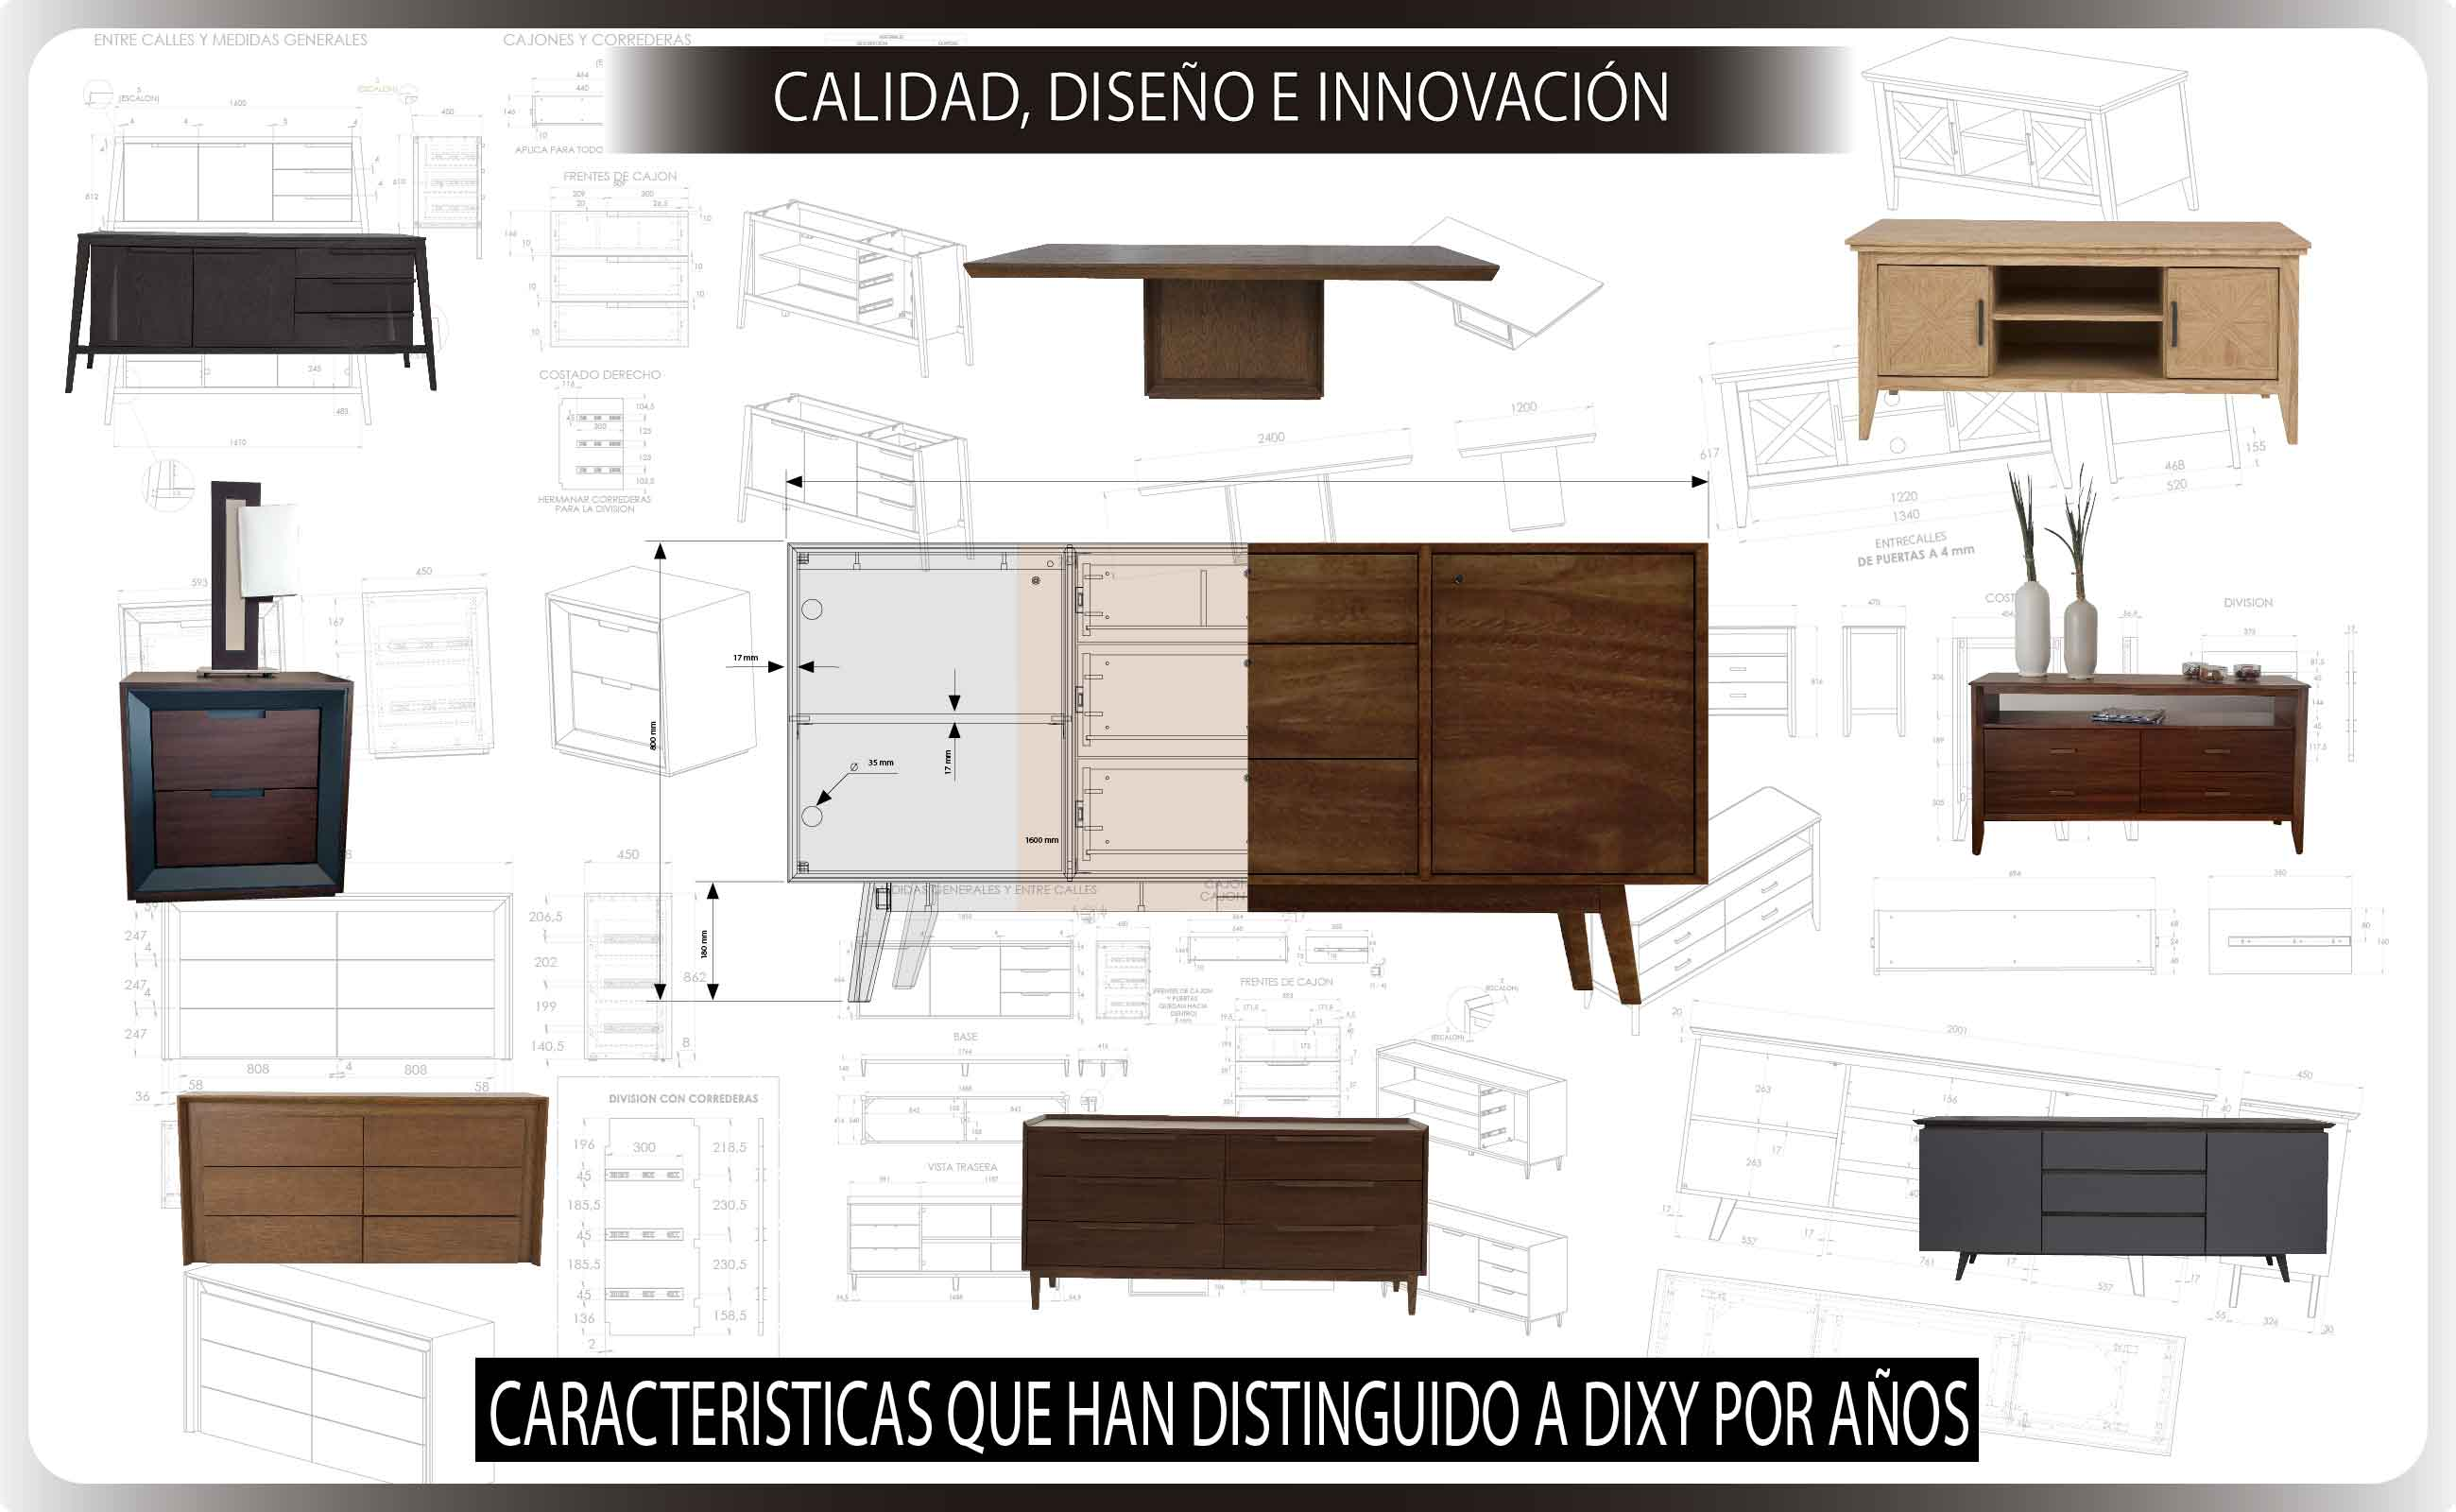 Muebles Dixy Pachuca - Dixy [mjhdah]https://lookaside.fbsbx.com/lookaside/crawler/media/?media_id=1046535028826475